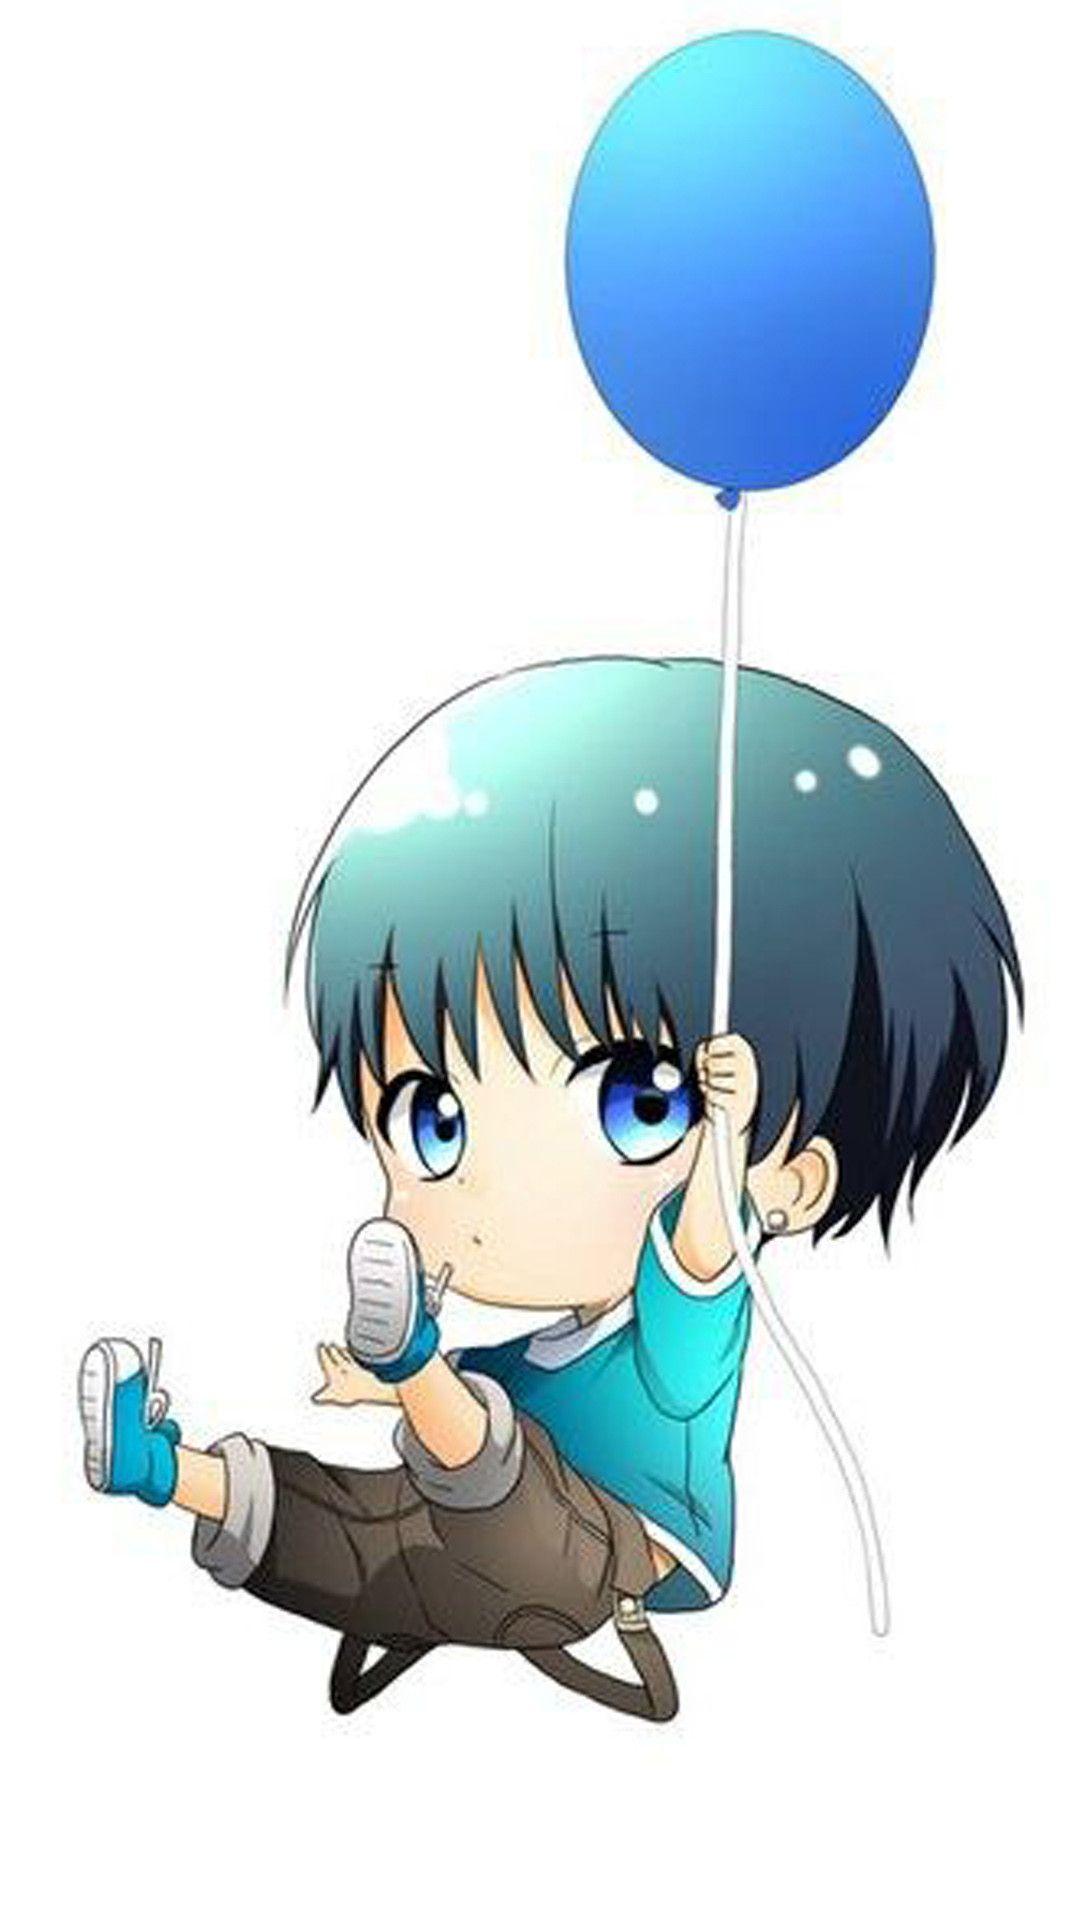 Pin By Andilo Barham On Aa Cute Anime Chibi Anime Chibi Kawaii Chibi